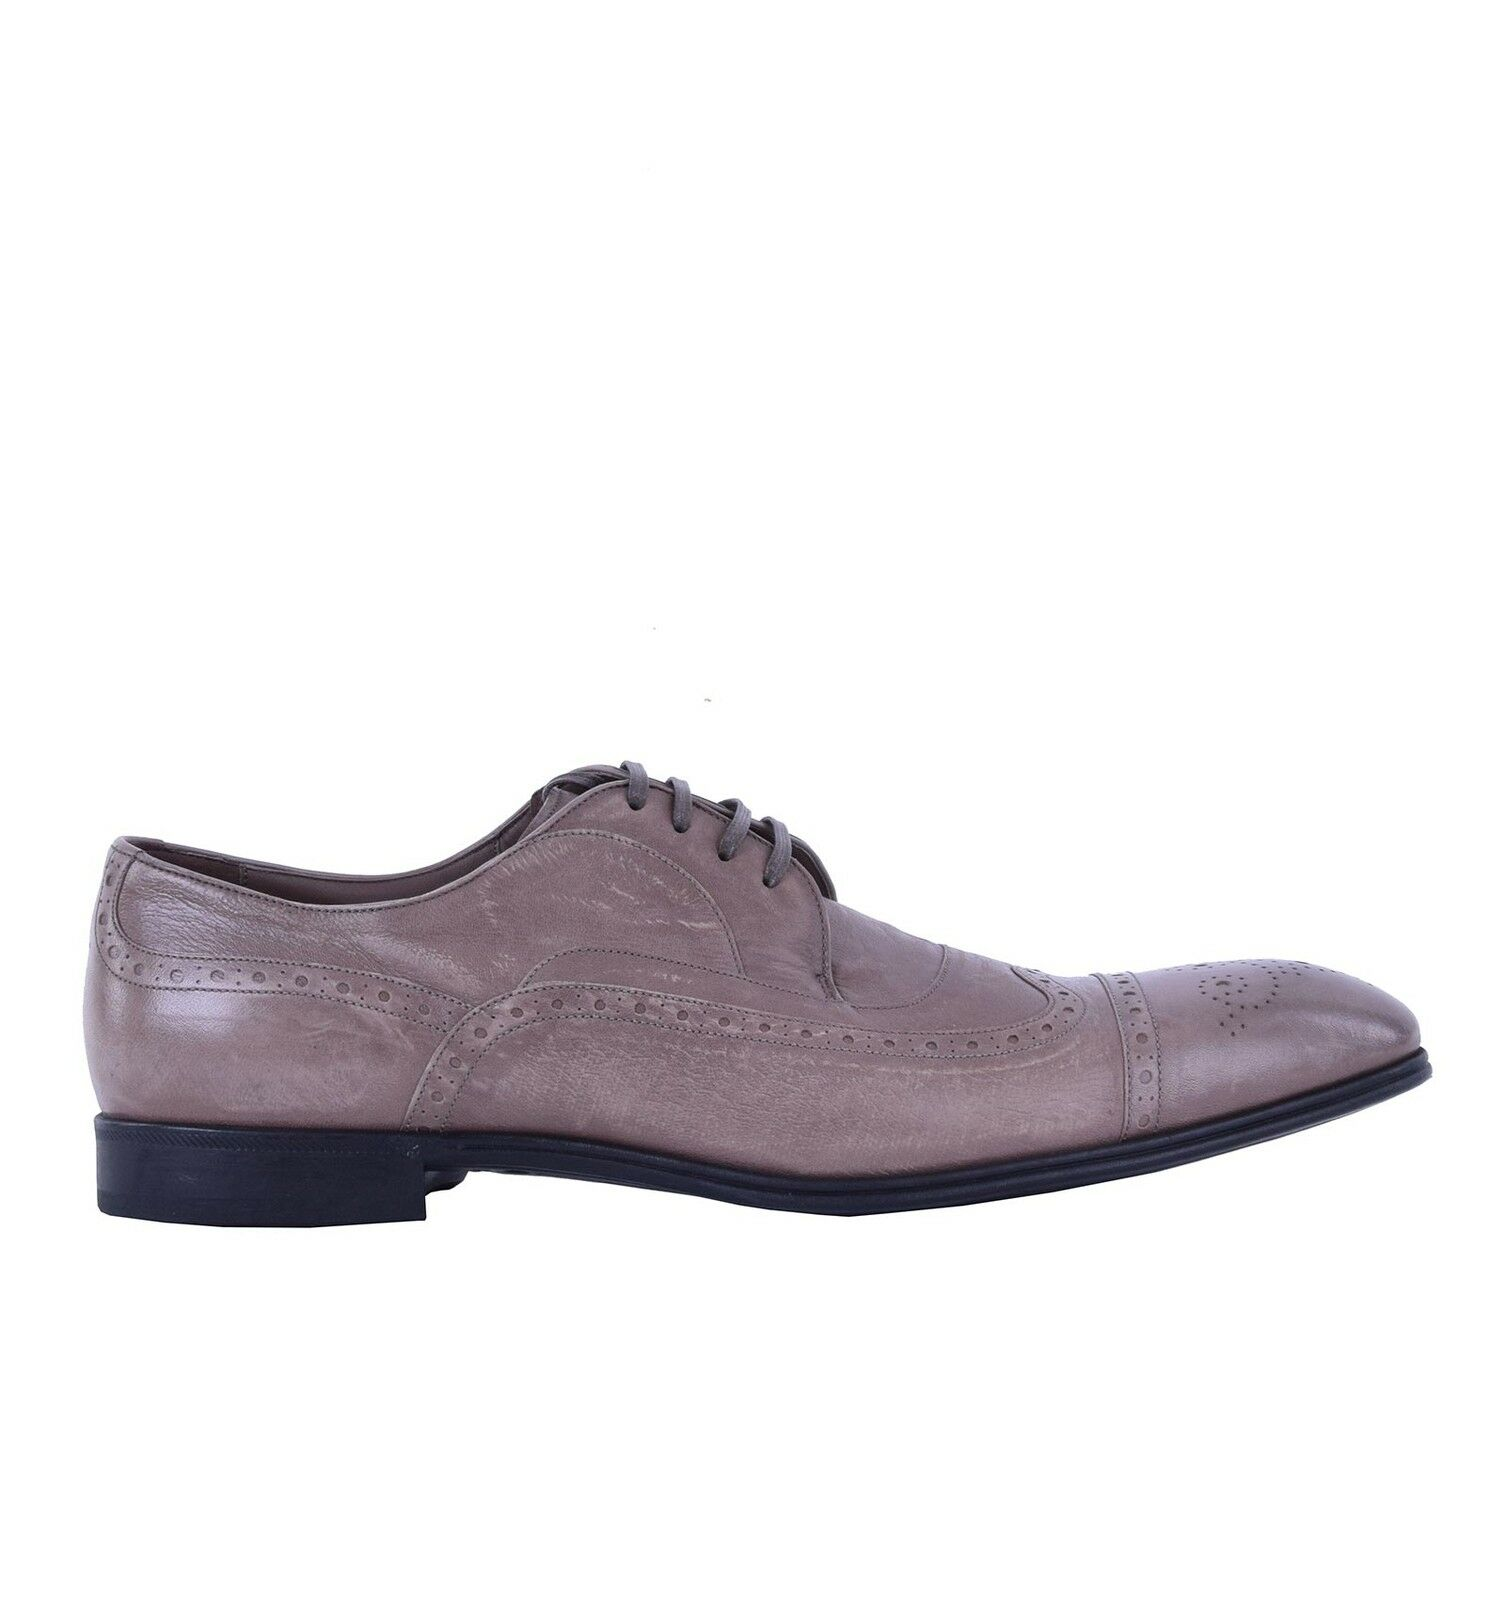 DOLCE & GABBANA Formelle Känguruleder Schuhe 05081 PORTOFINO Beige Formal Schuhes 05081 Schuhe 89a508